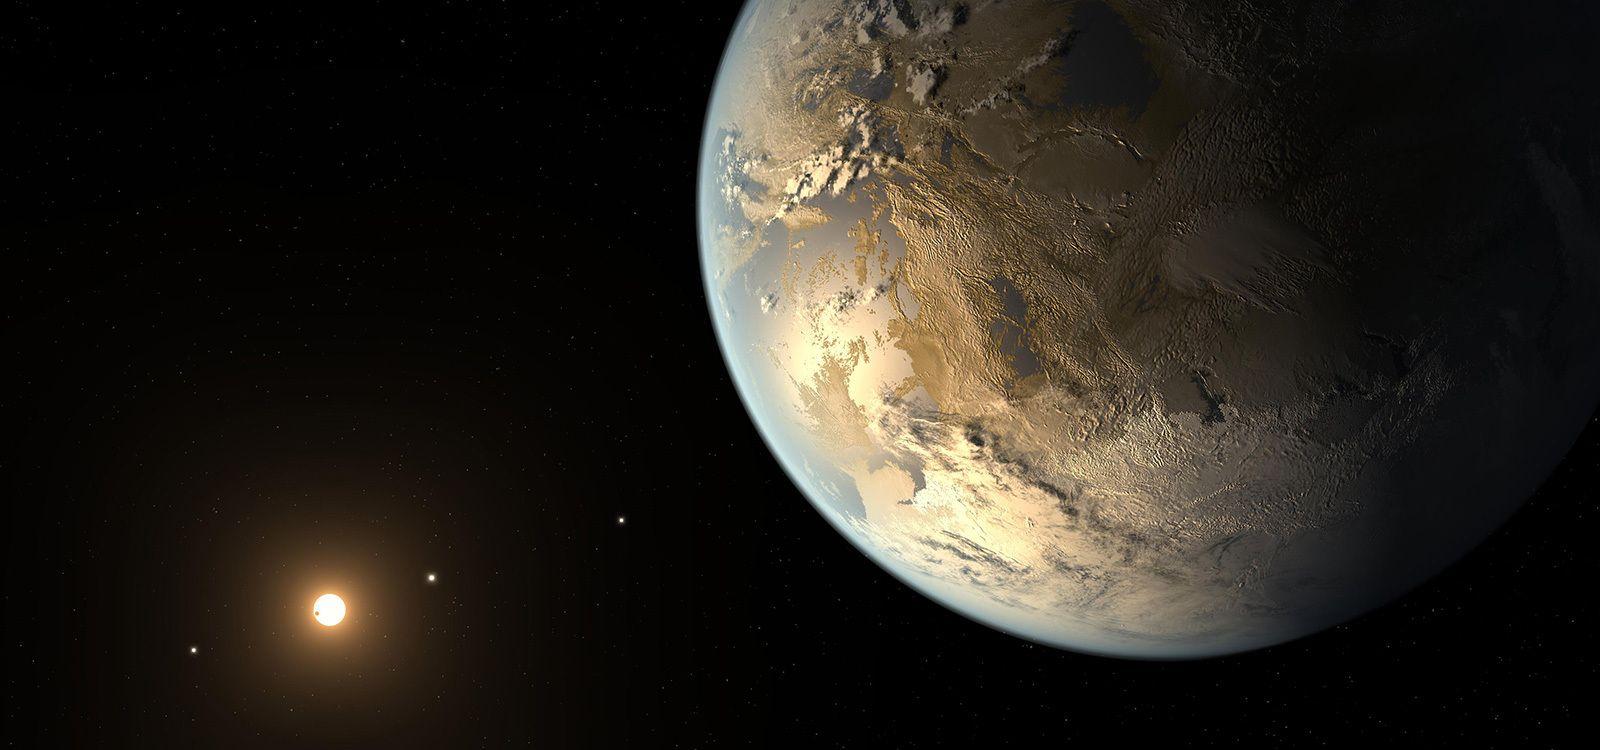 04_23_exoplanet_escape_velocity